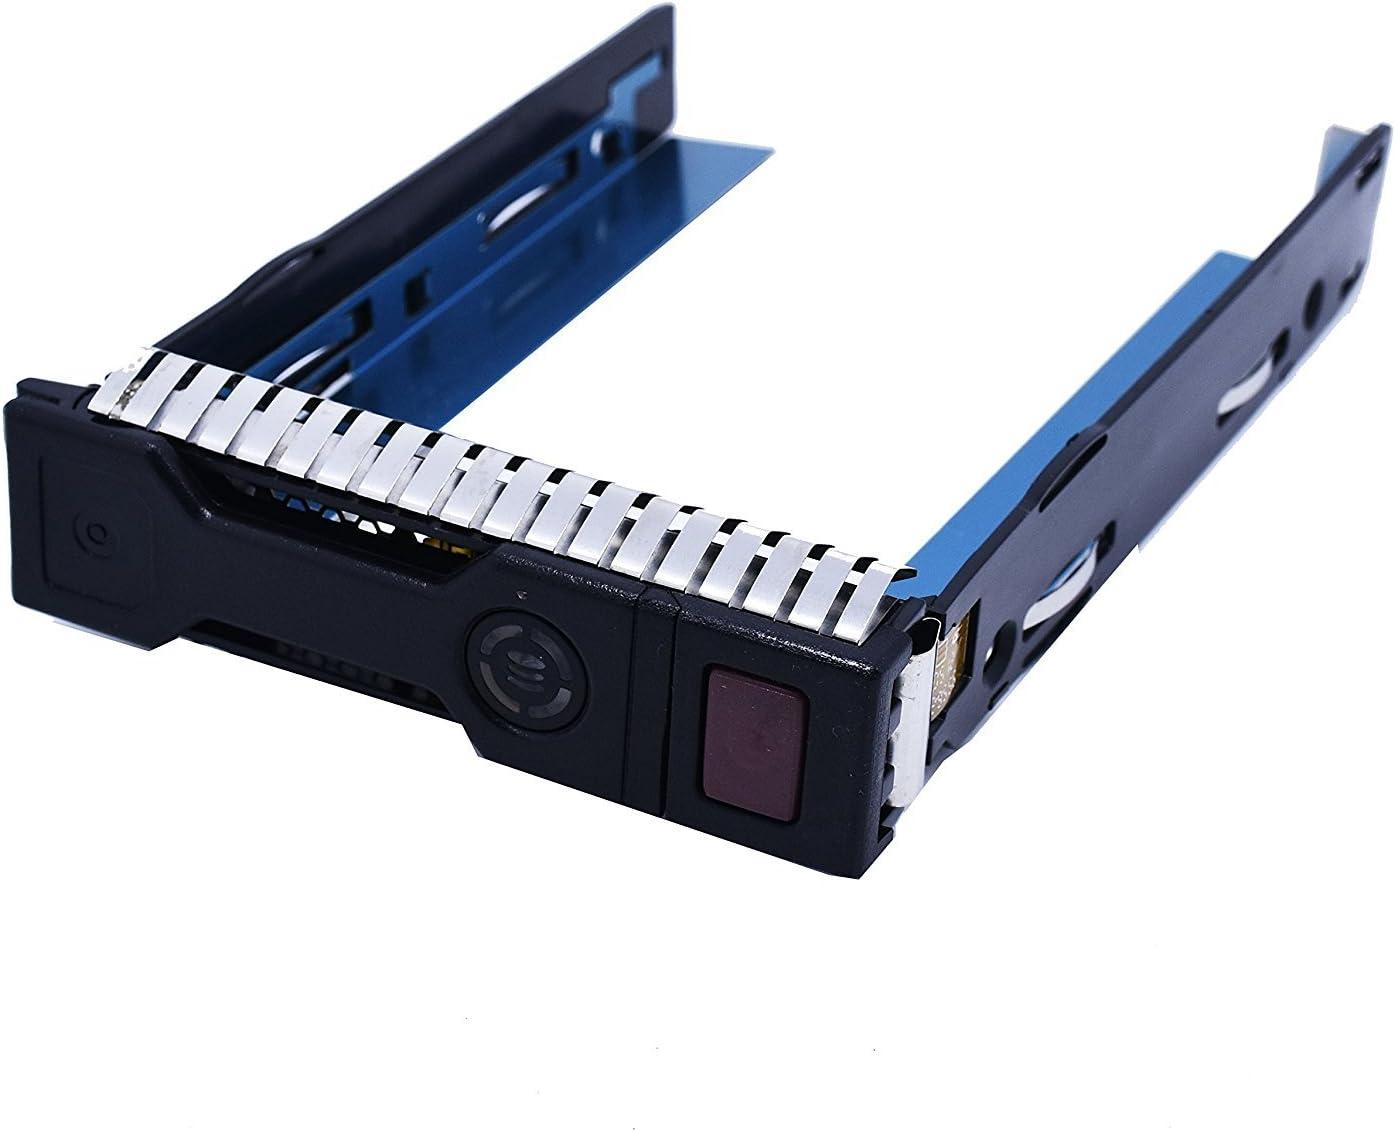 "HP 651687-001 651699 2.5/"" SAS SATA Drive Tray DL380p DL360p DL160 DL560 DL385 G8"